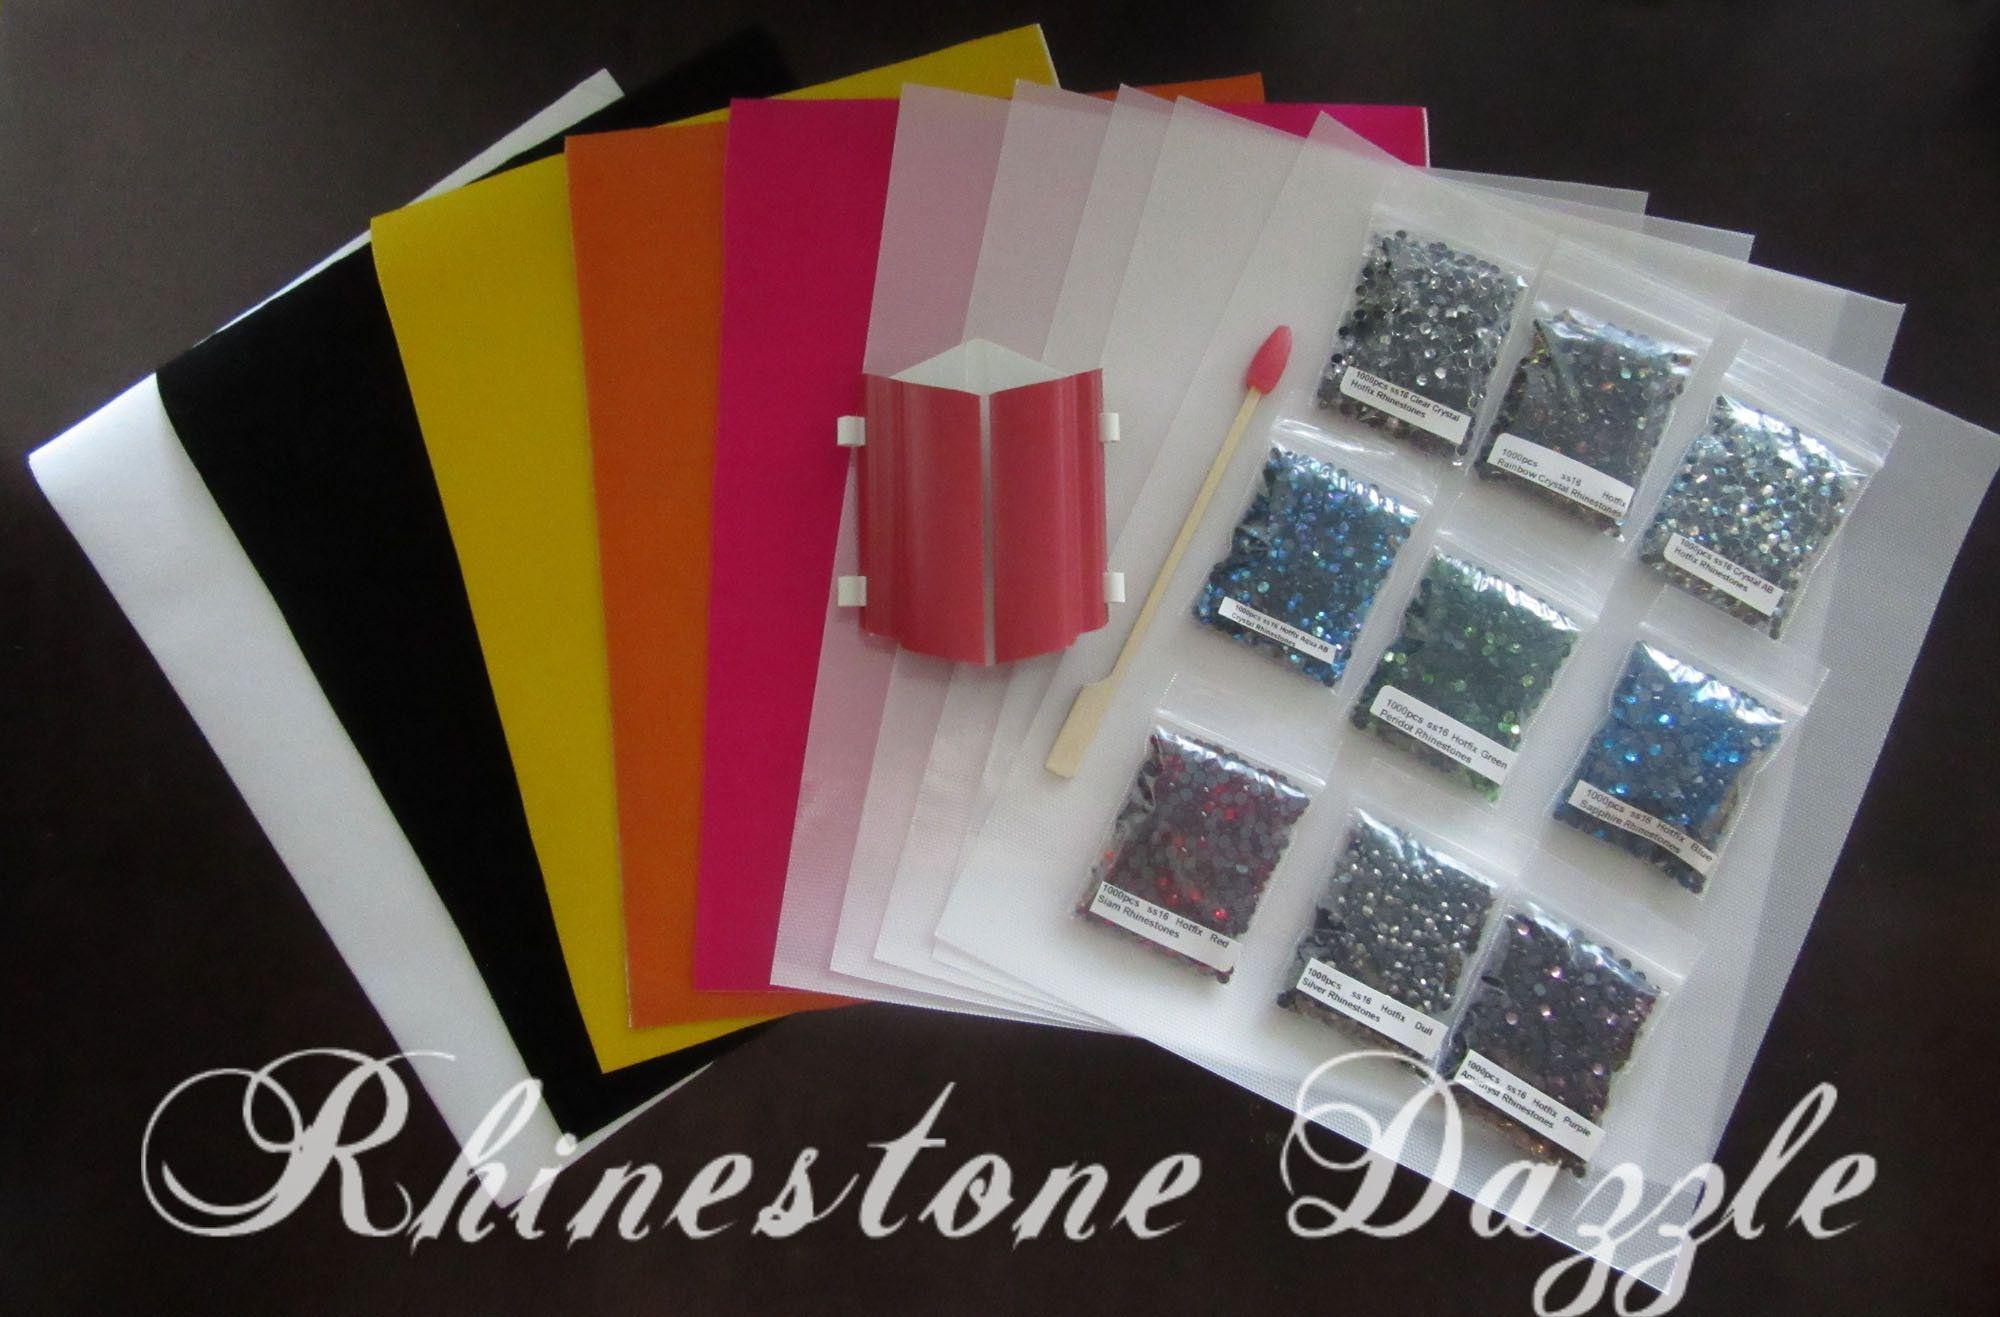 3000pcs Ss16 Hotfix Crystal Rhinestones Sticky Flock Template Etsy Rhinestone Transfers Design Rhinestone Sticker Crystal Rainbow